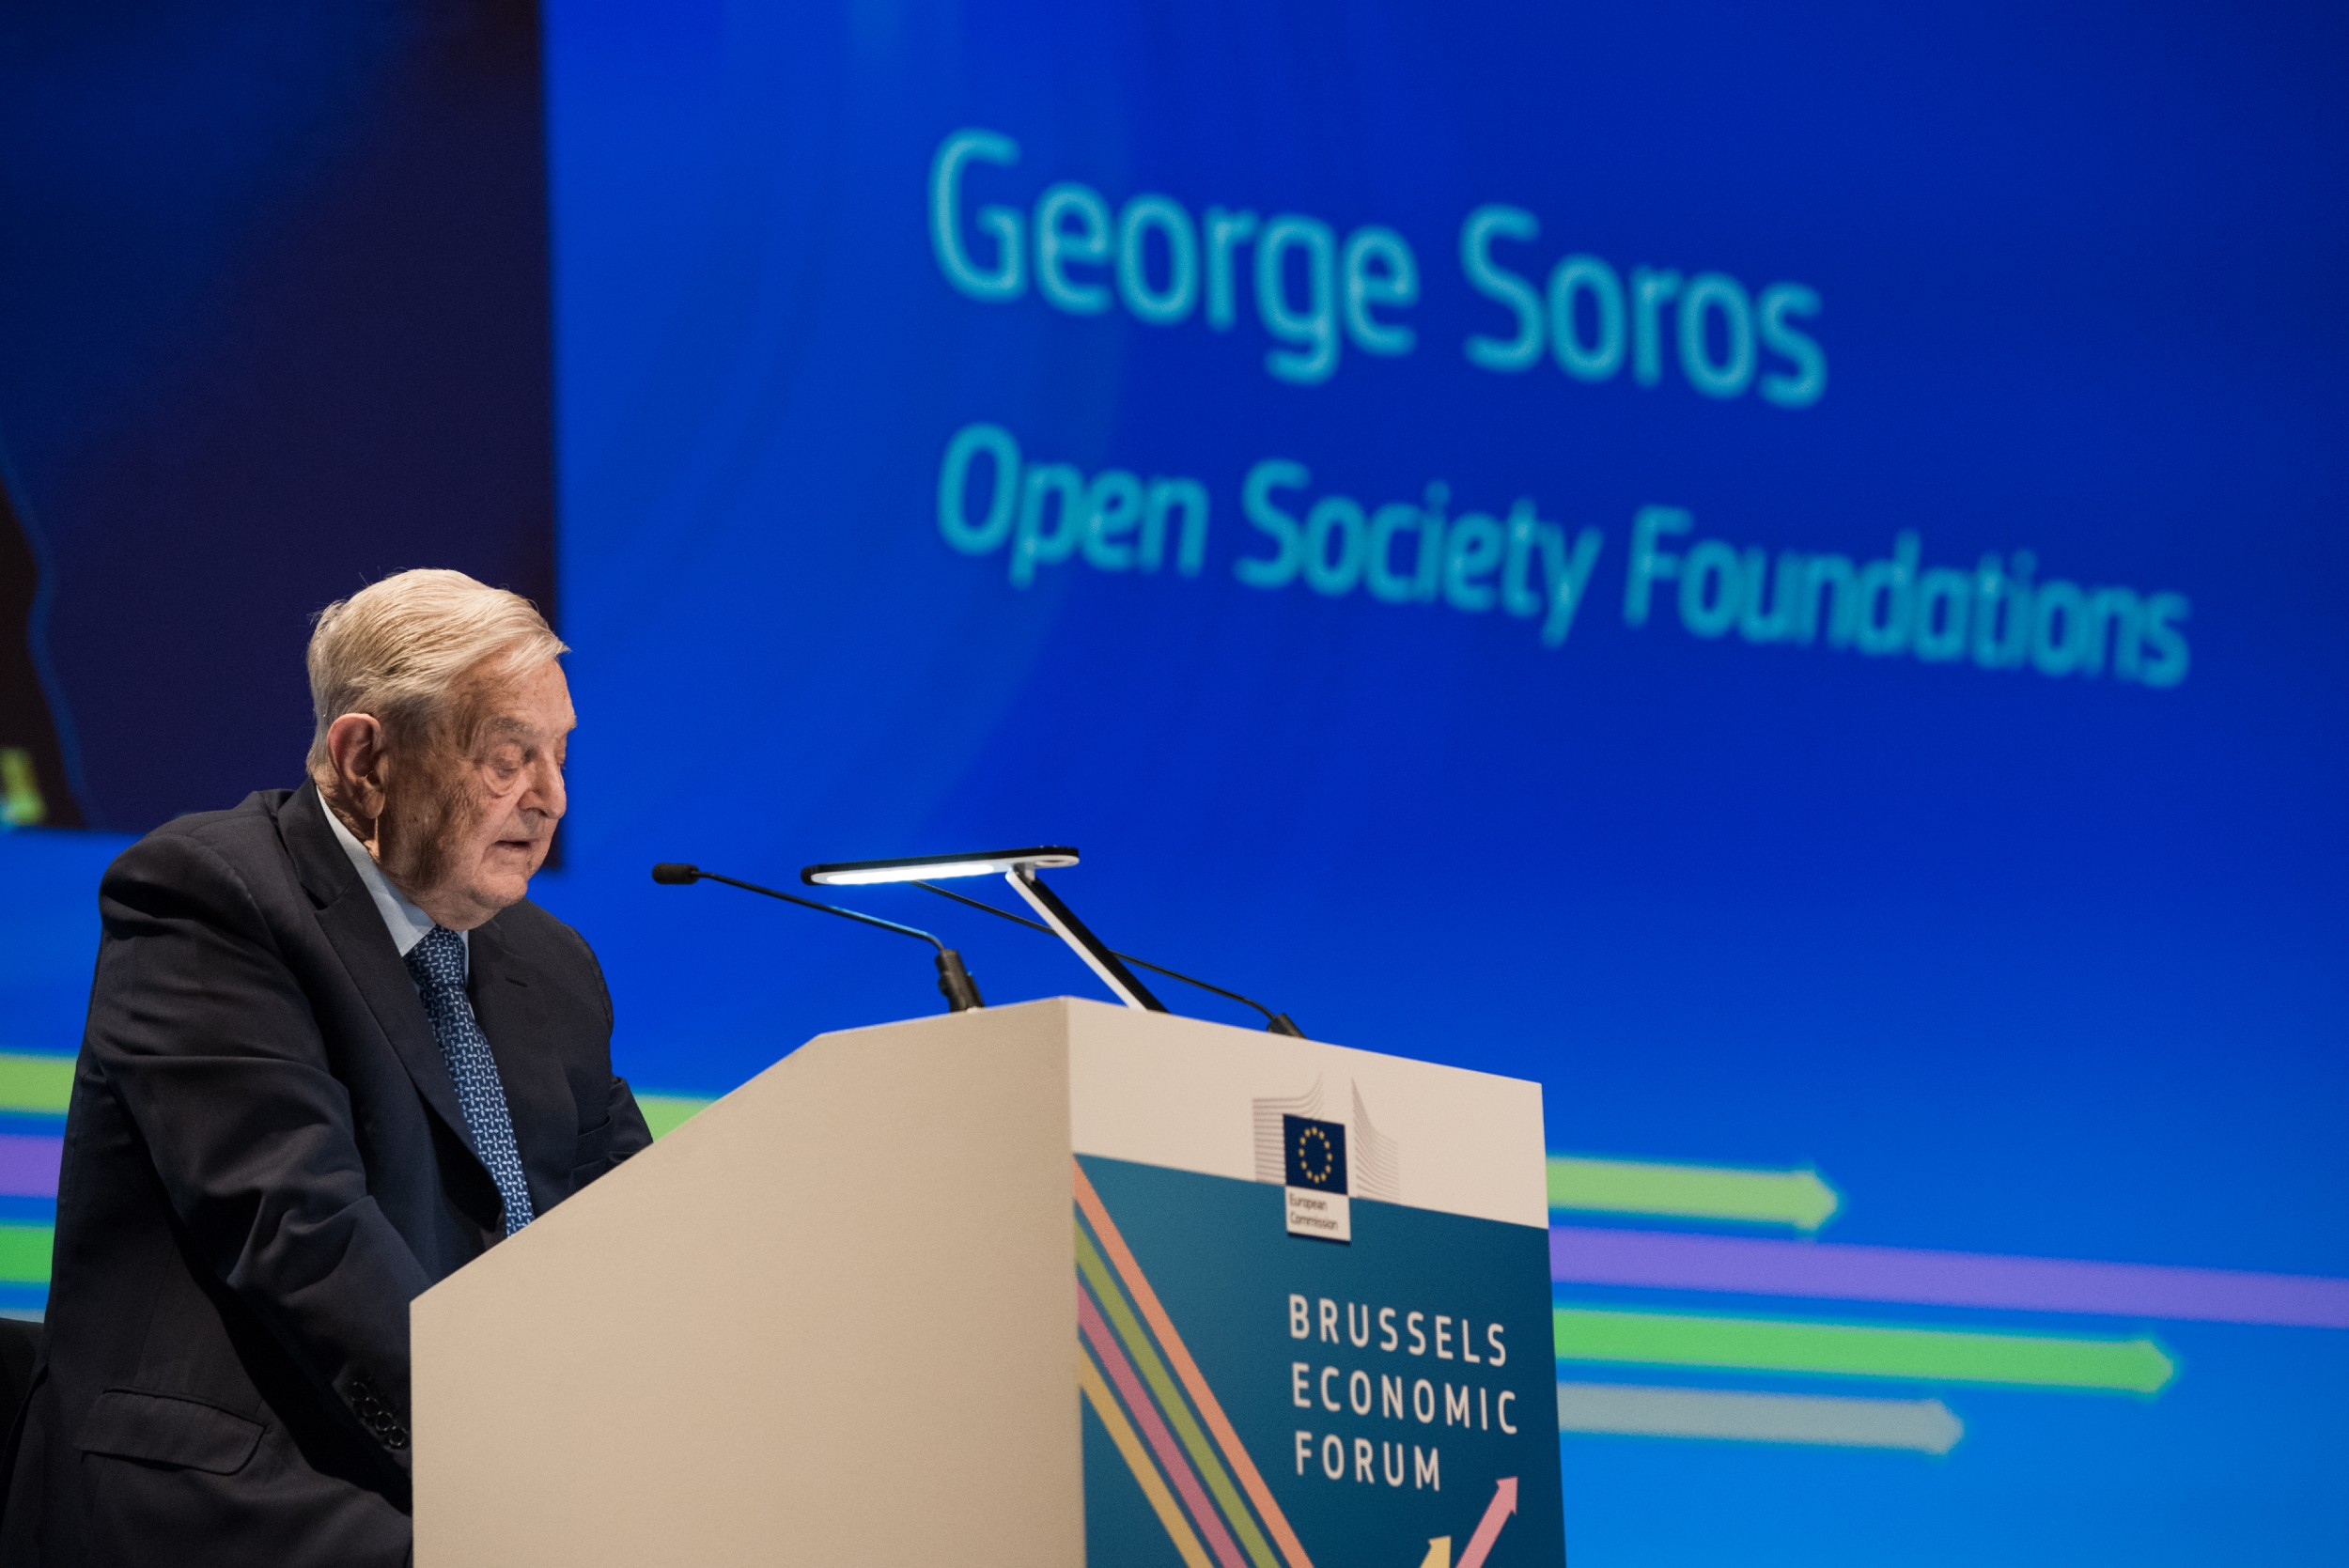 Džordž Soroš, osnivač i predsednik Fonda za otvoreno društvo govori na Briselskom ekonomskom forumu, 01. jun 2017. (Foto: European Commission)